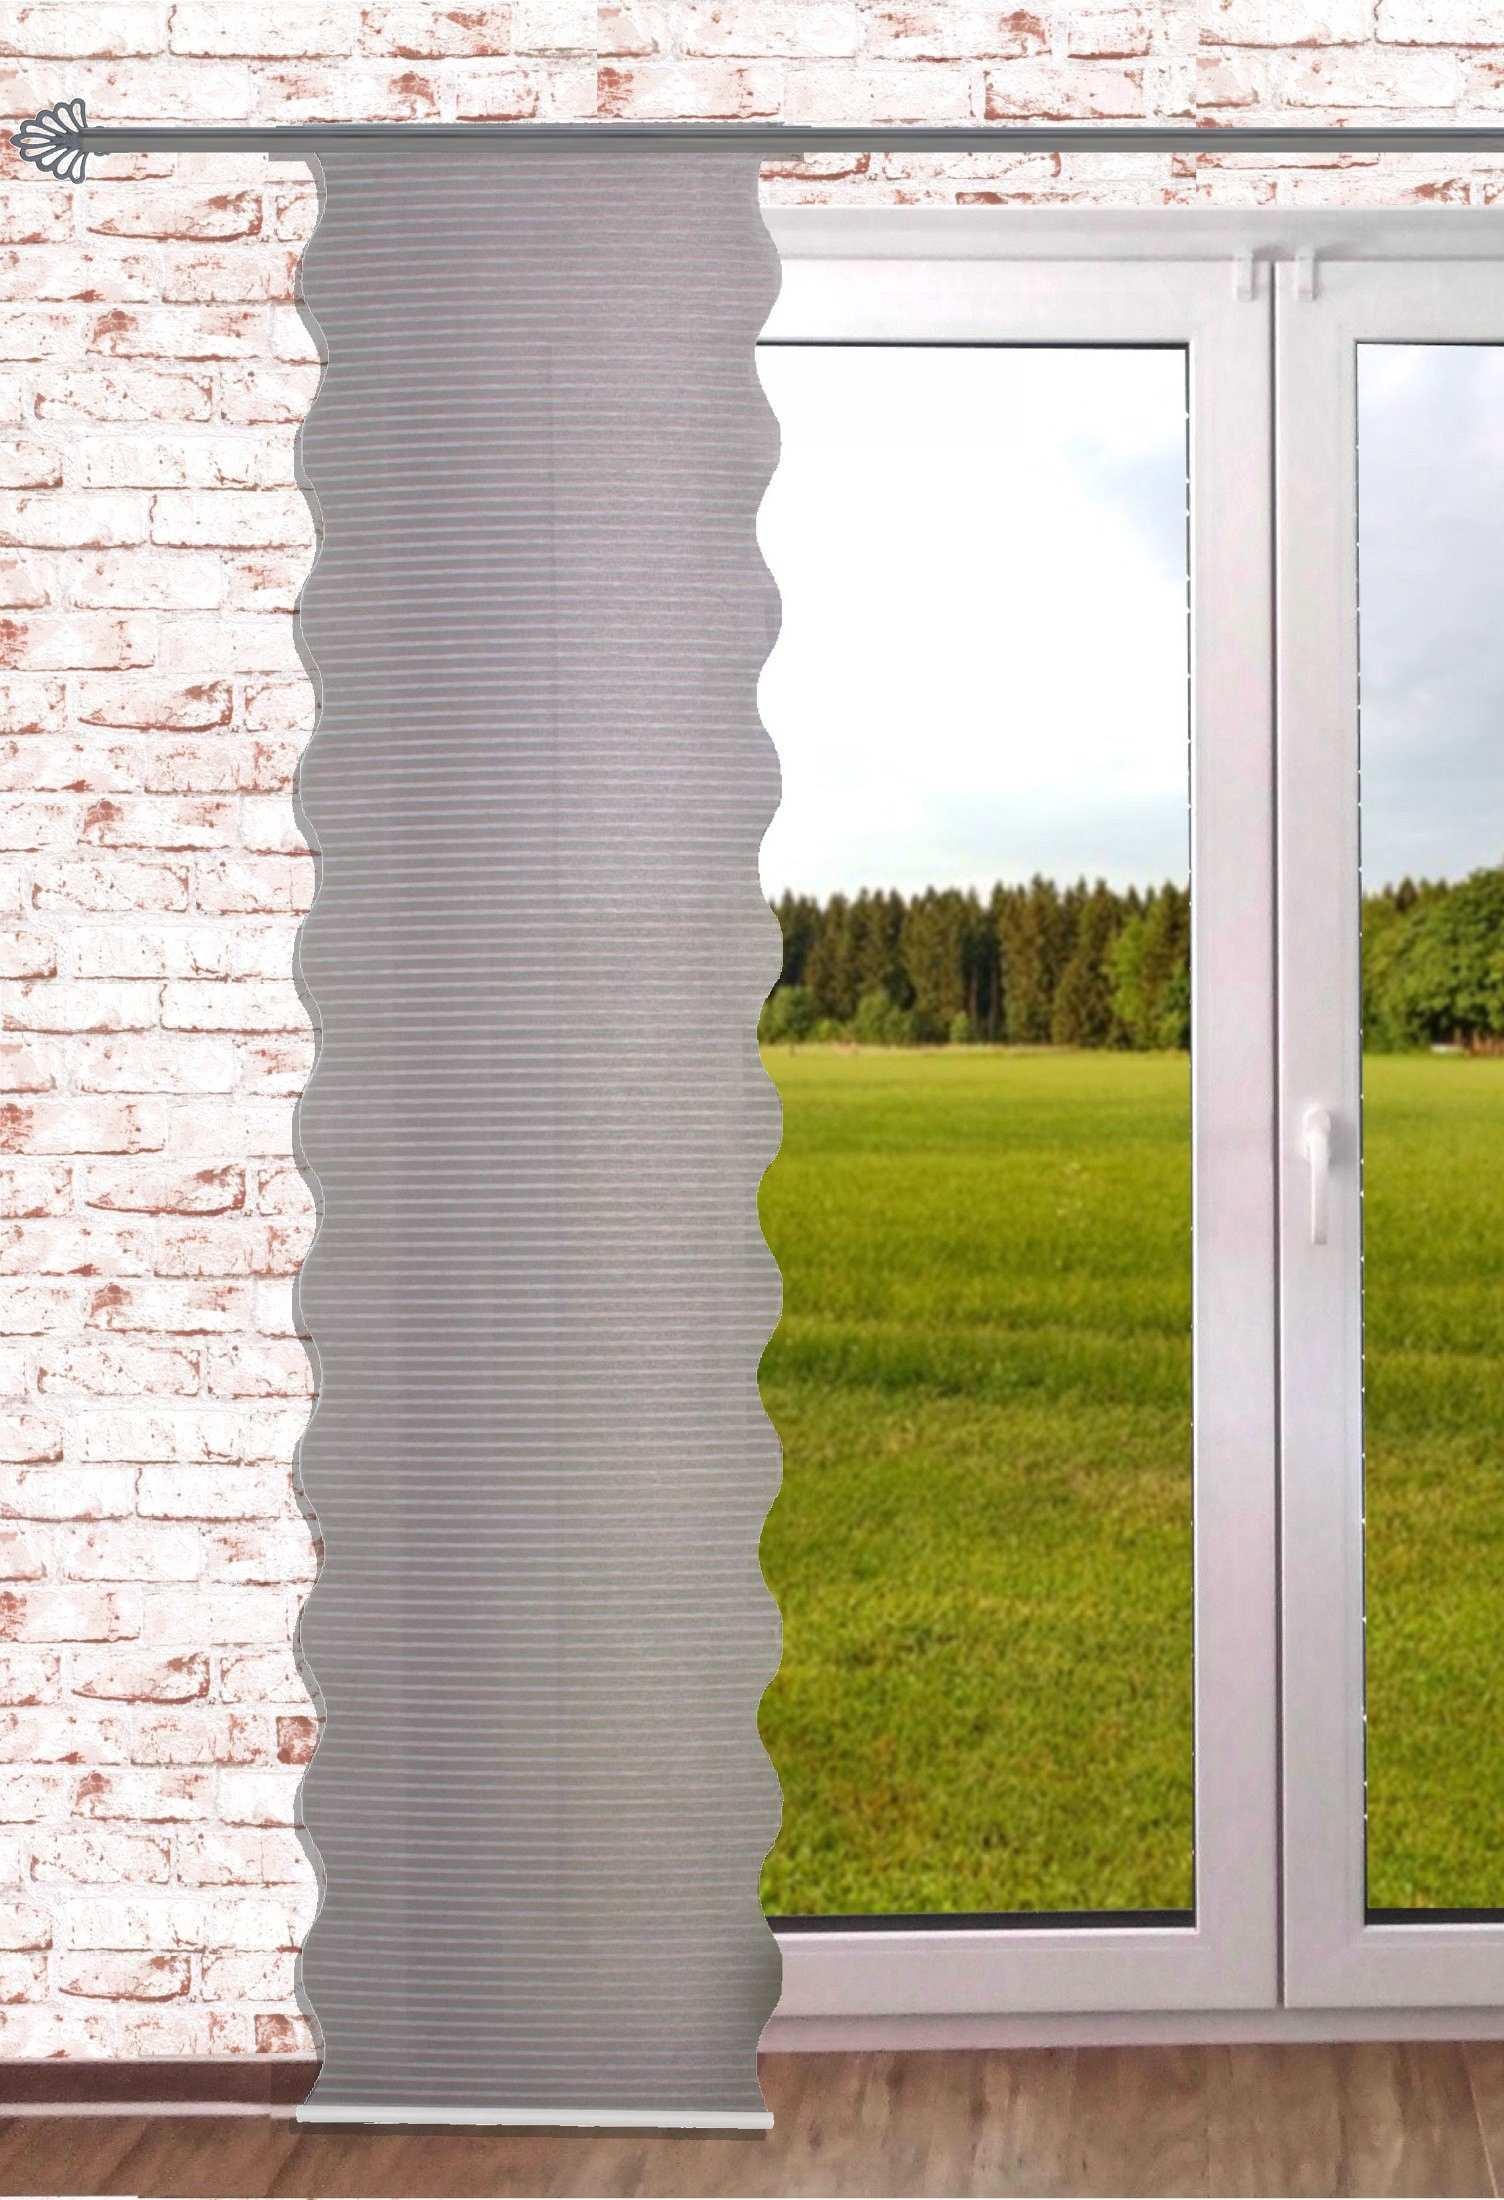 Full Size of Scheibengardinen Blickdicht Gardinen Welt Online Shop Schiebevorhang Küche Wohnzimmer Scheibengardinen Blickdicht